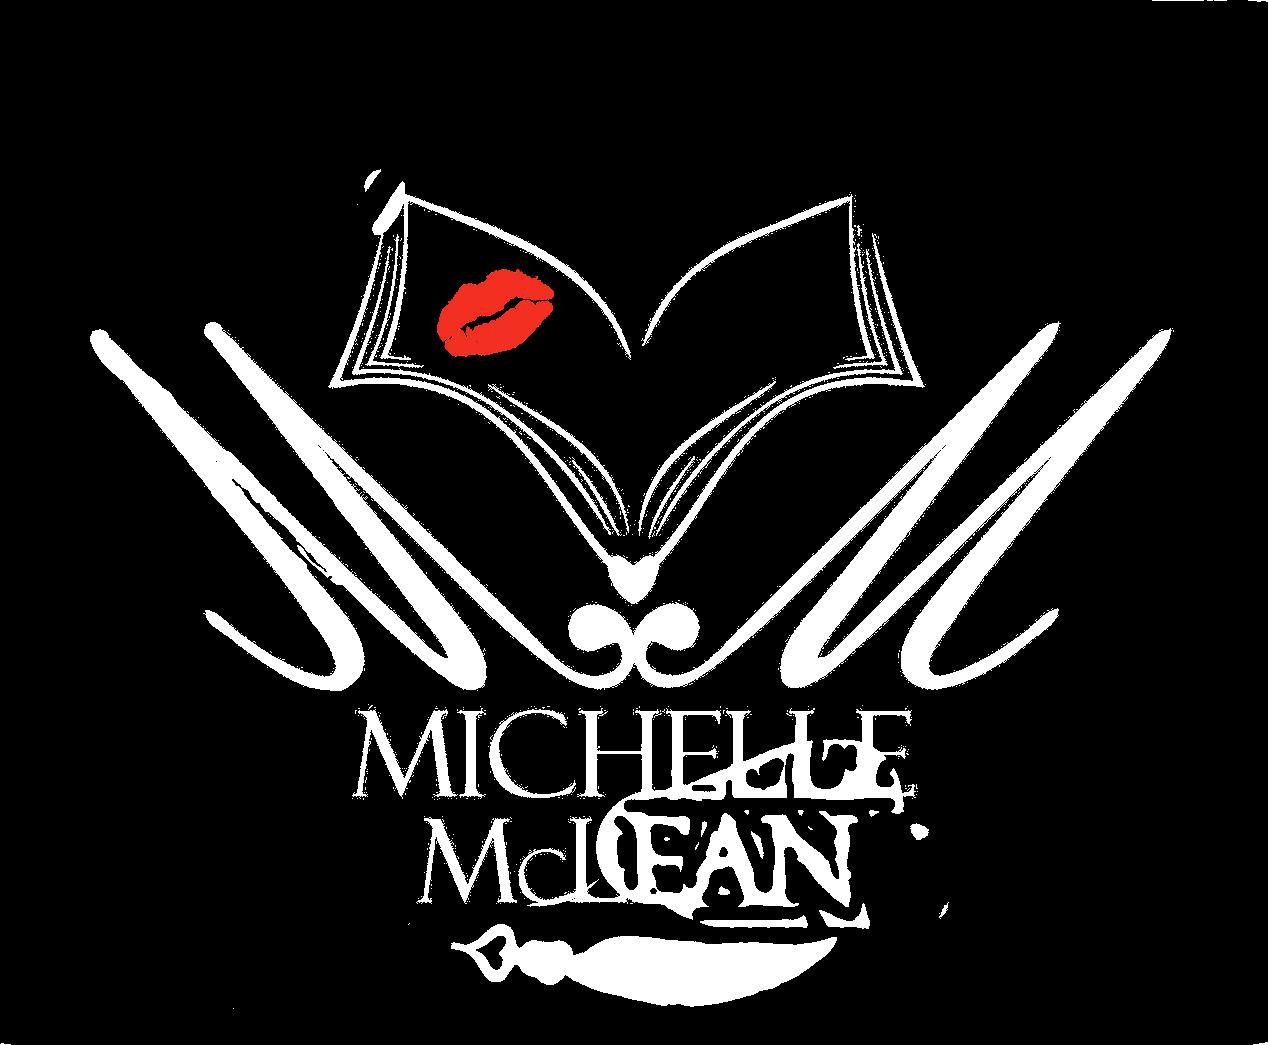 Michelle McLean / Kira Archer